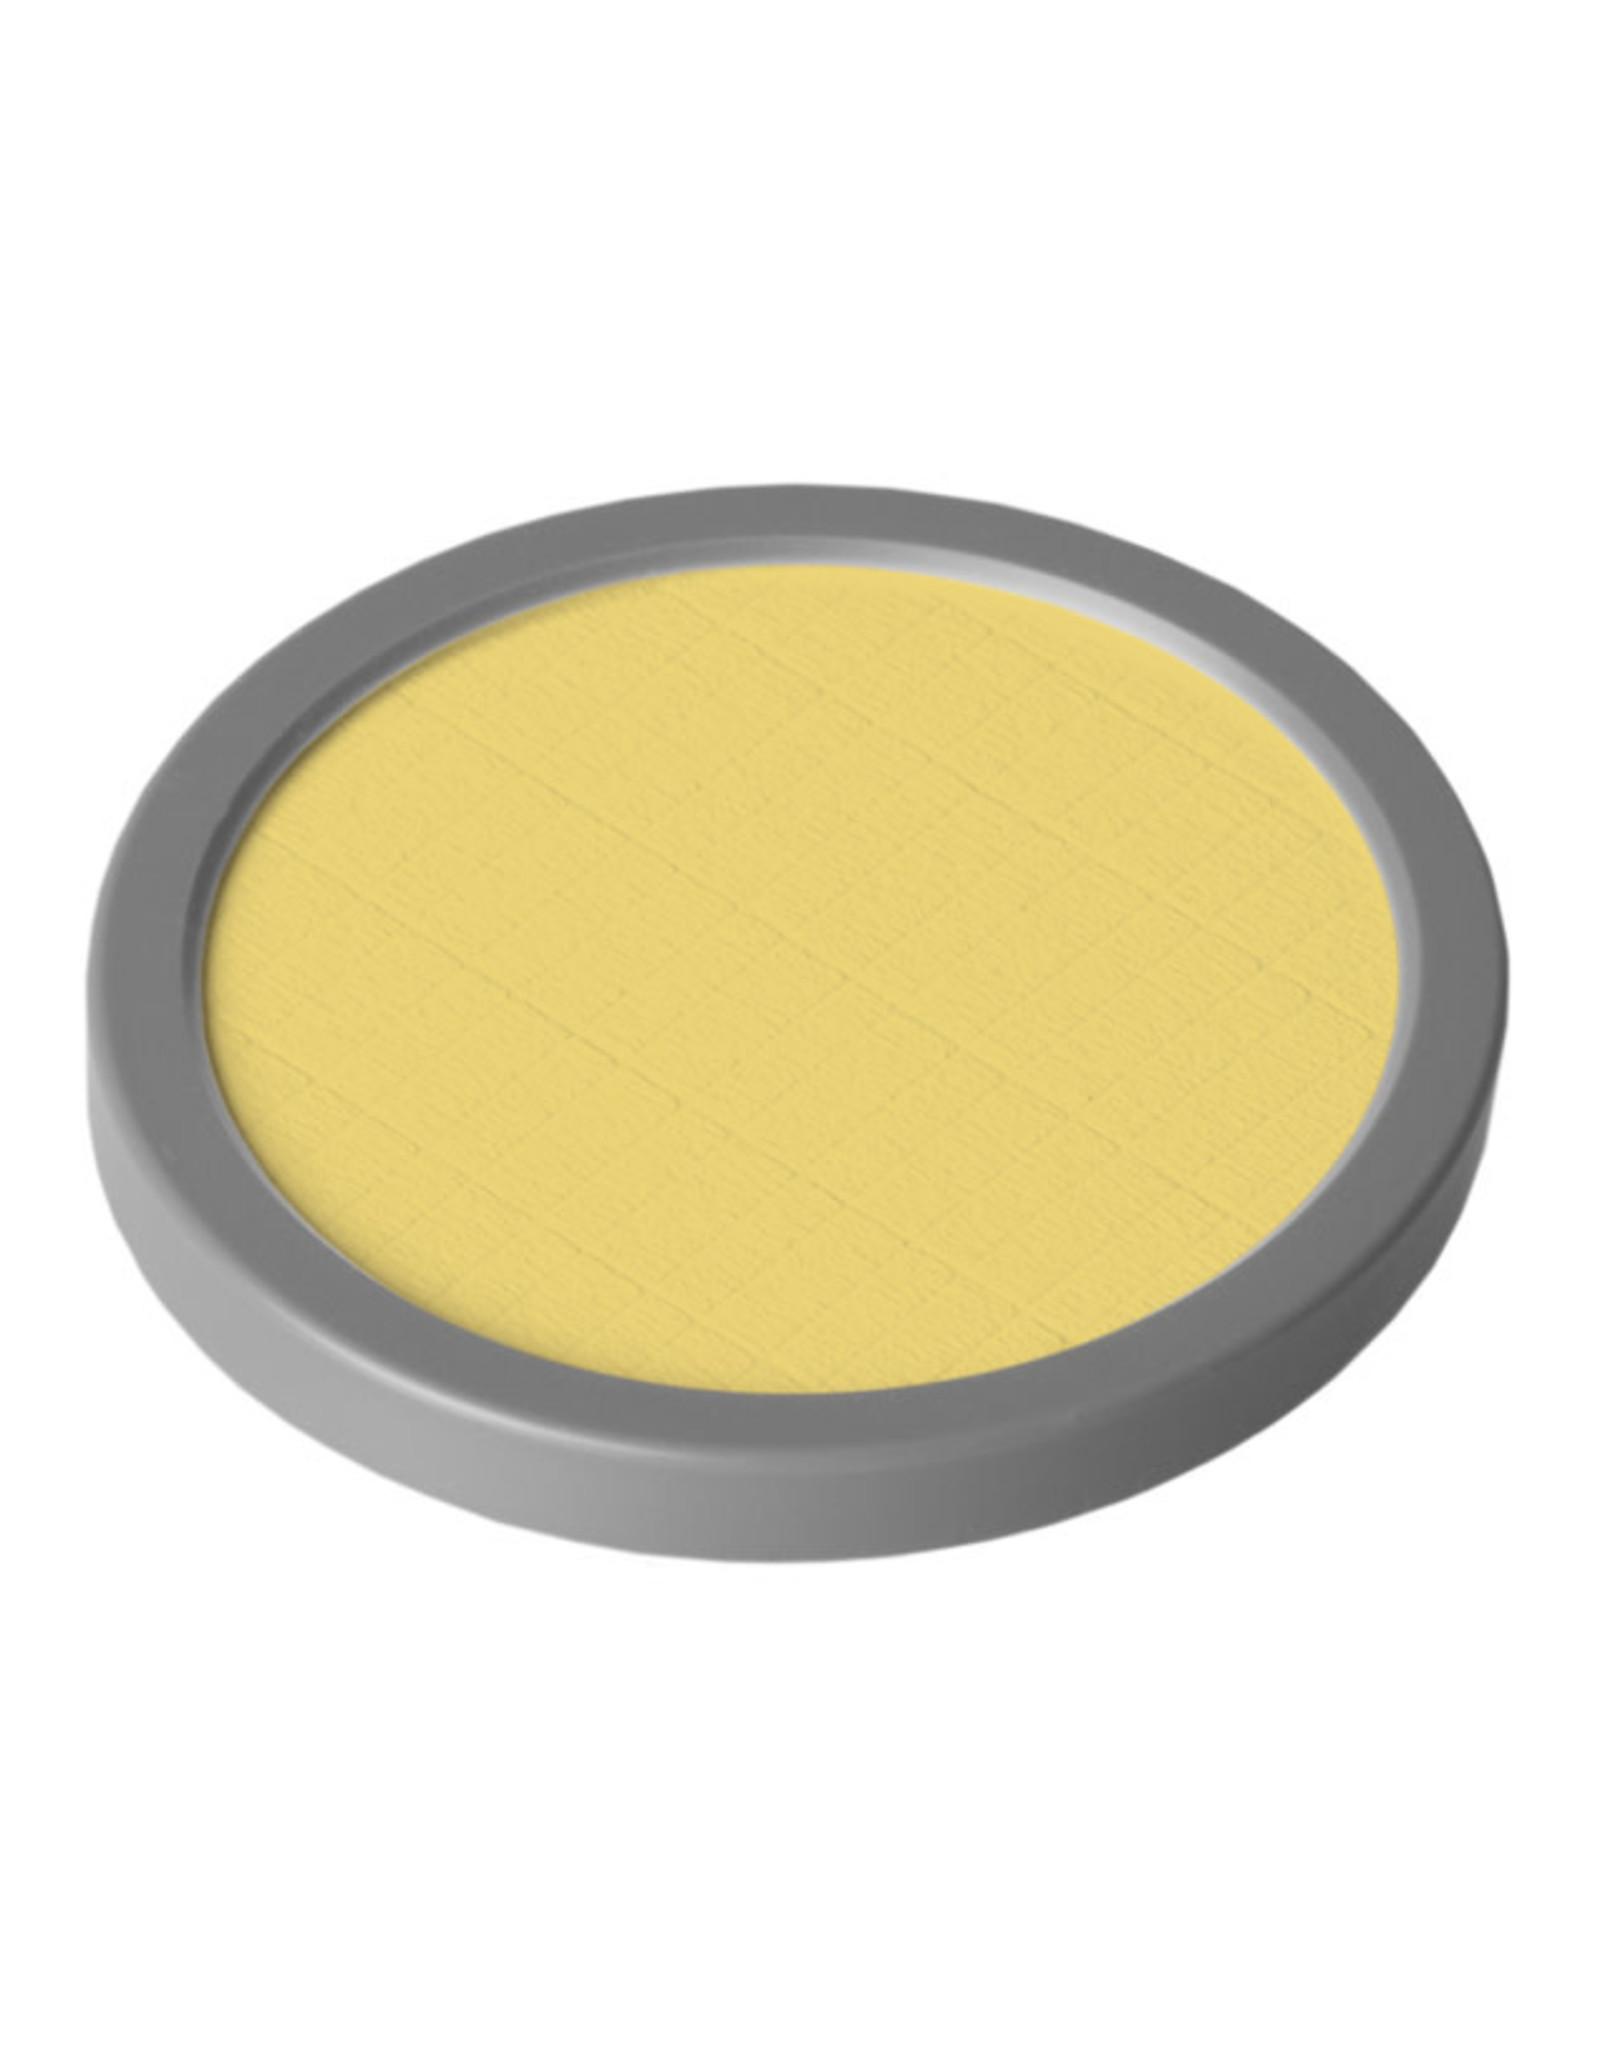 Grimas CAKE MAKE-UP 1521 Shock/Lijk 35 g